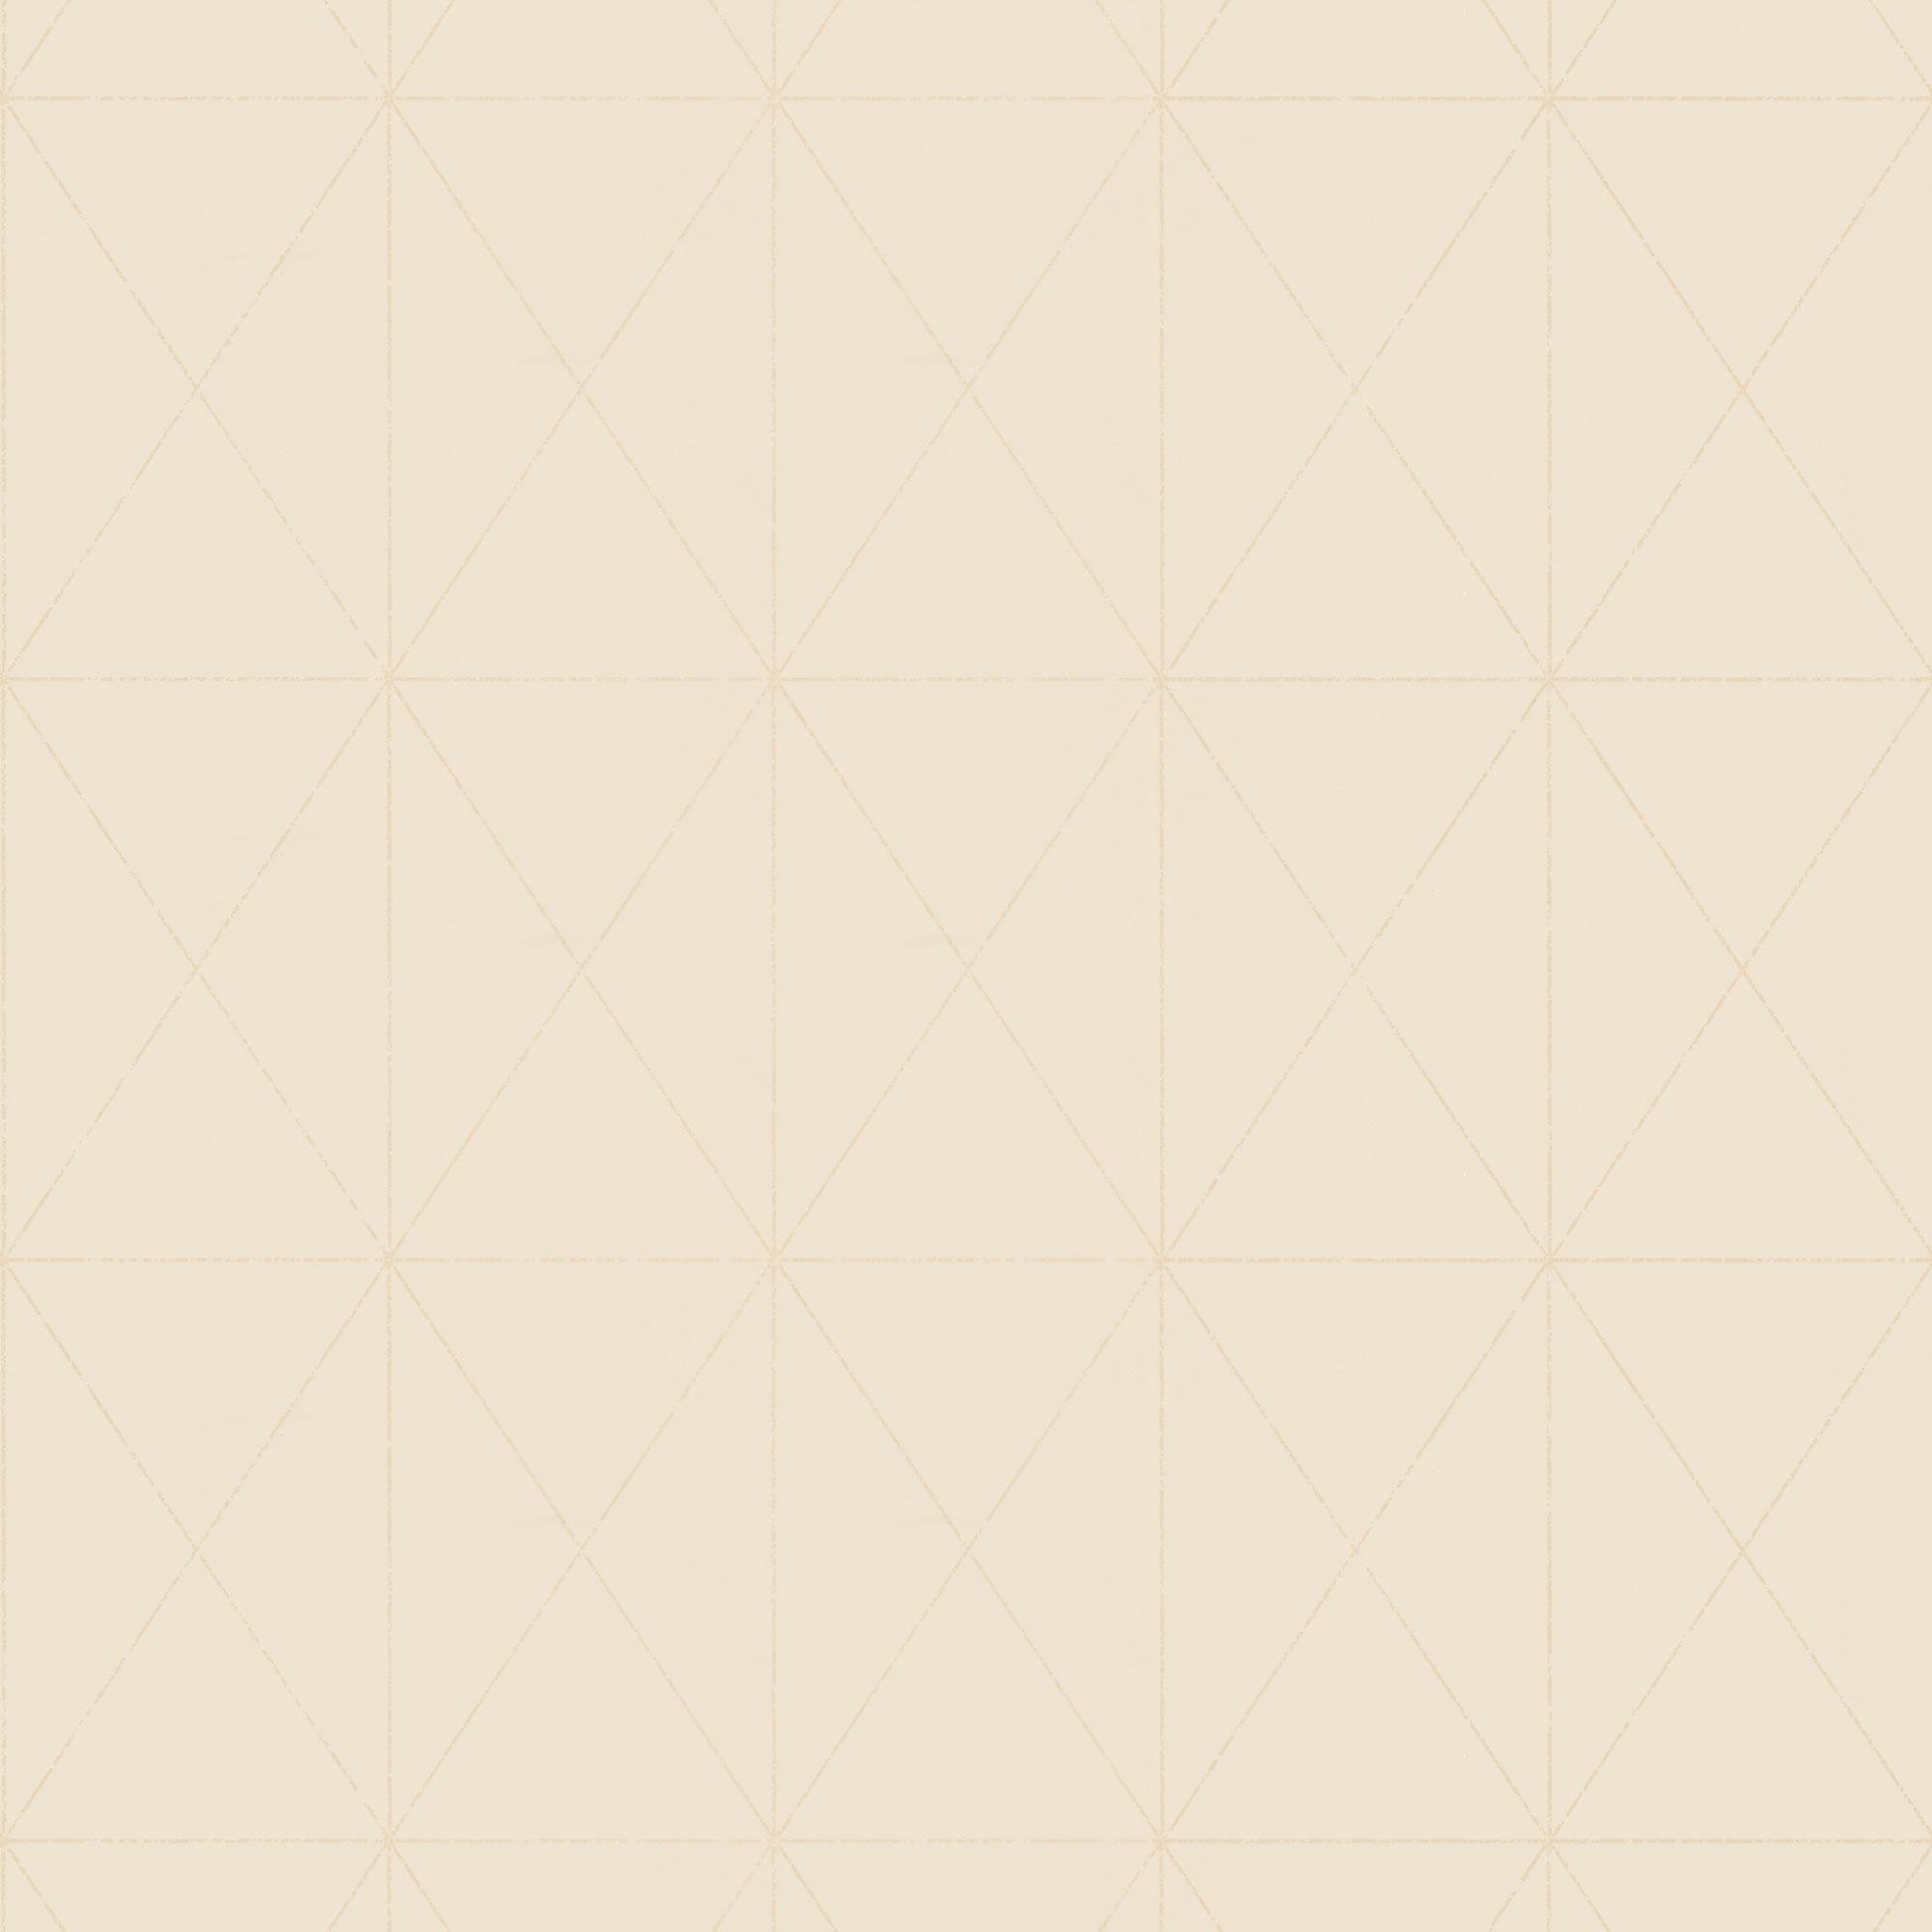 Шведские обои Sandberg,  коллекция Grace, артикул577-04